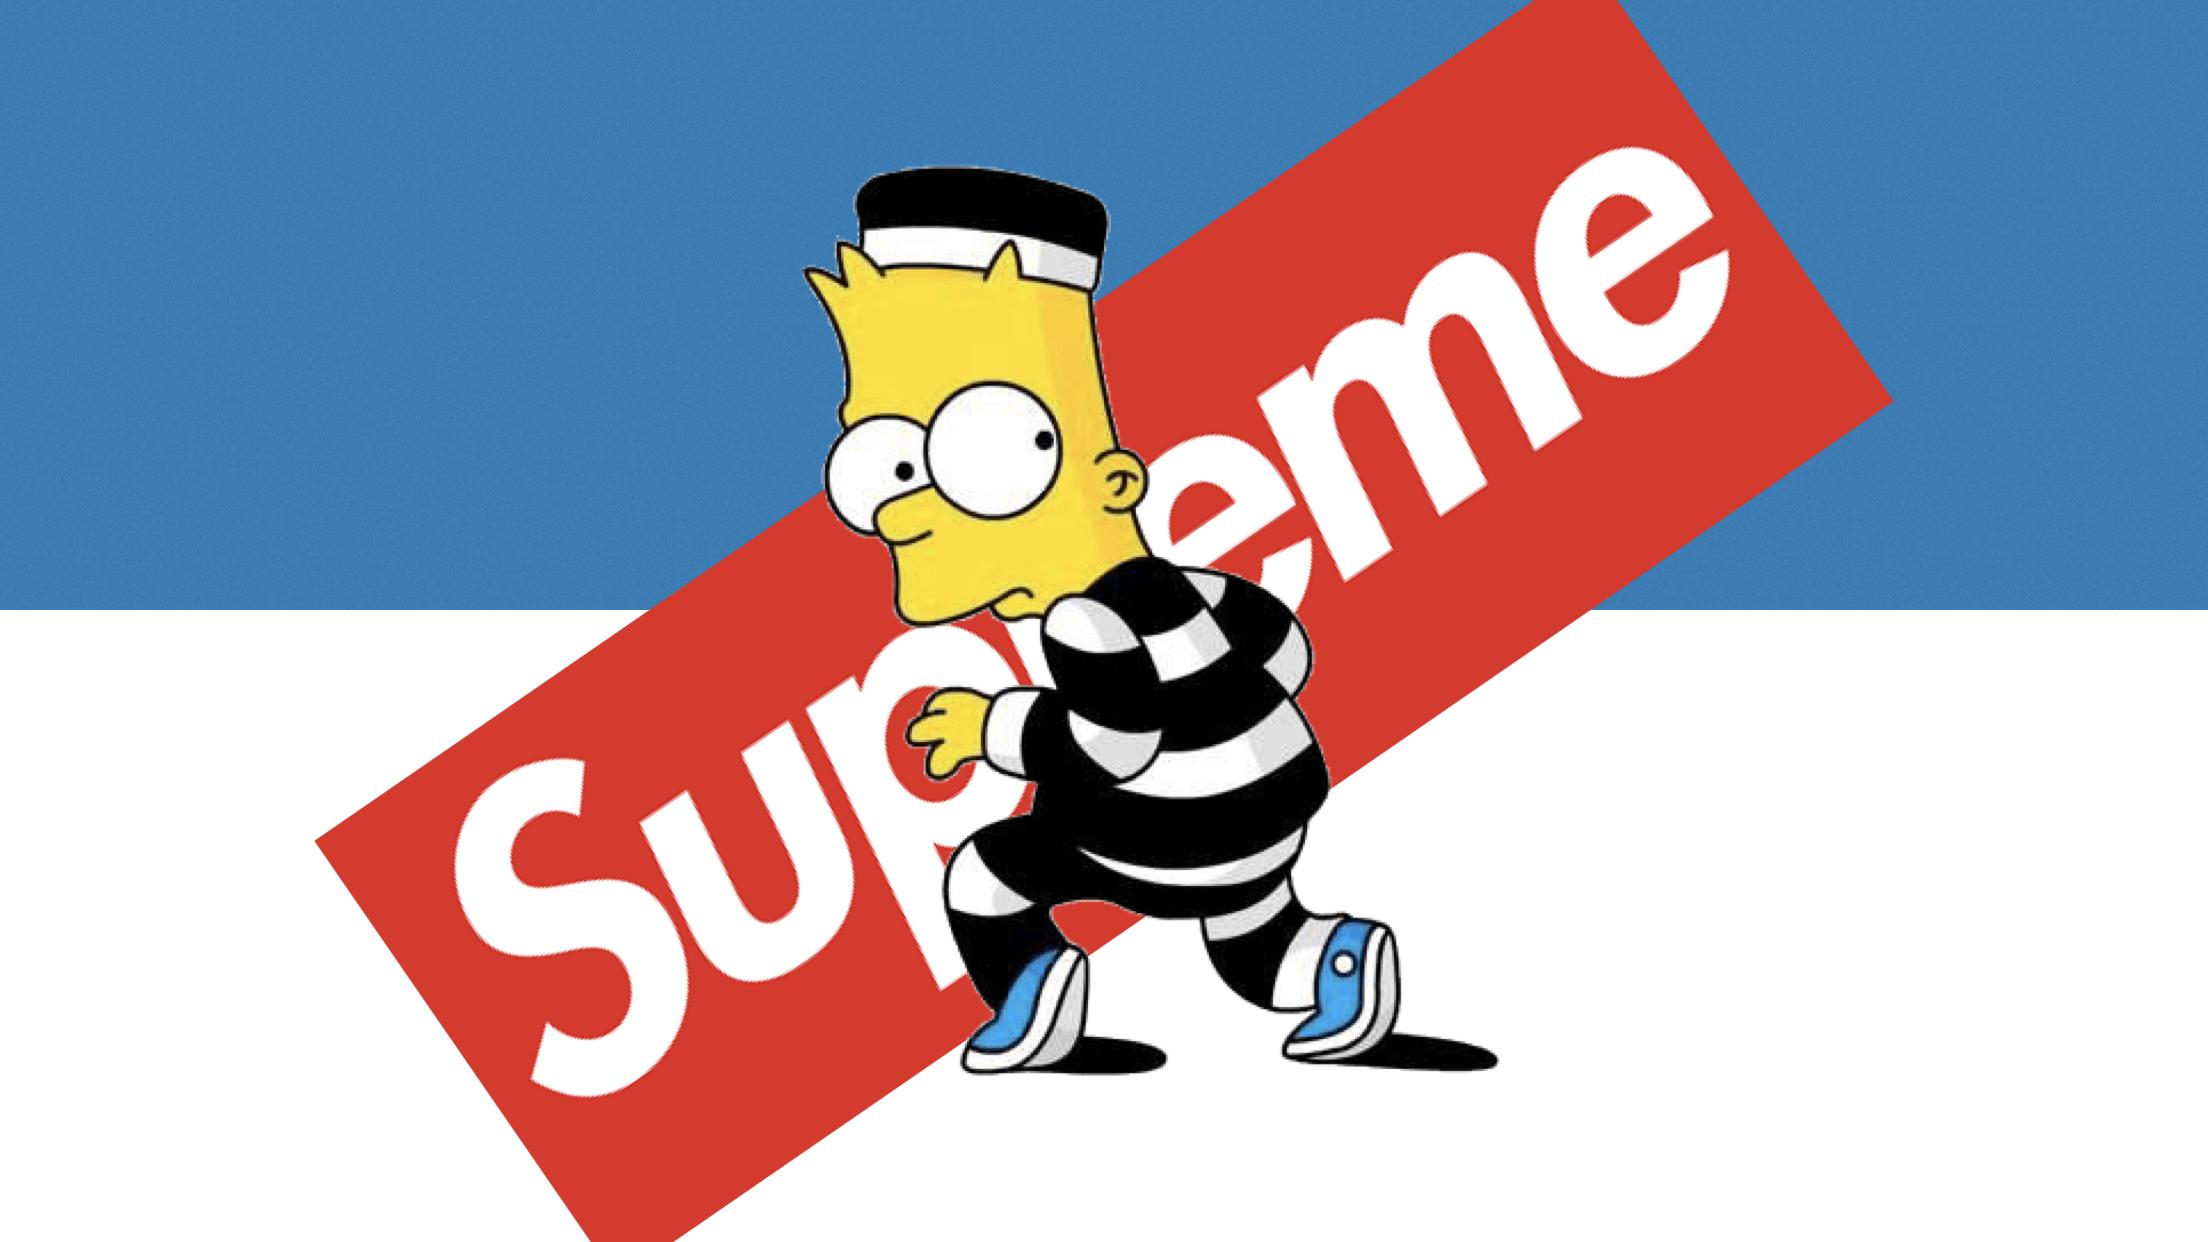 Supreme Simpson Laptop Wallpapers - Top Free Supreme ...